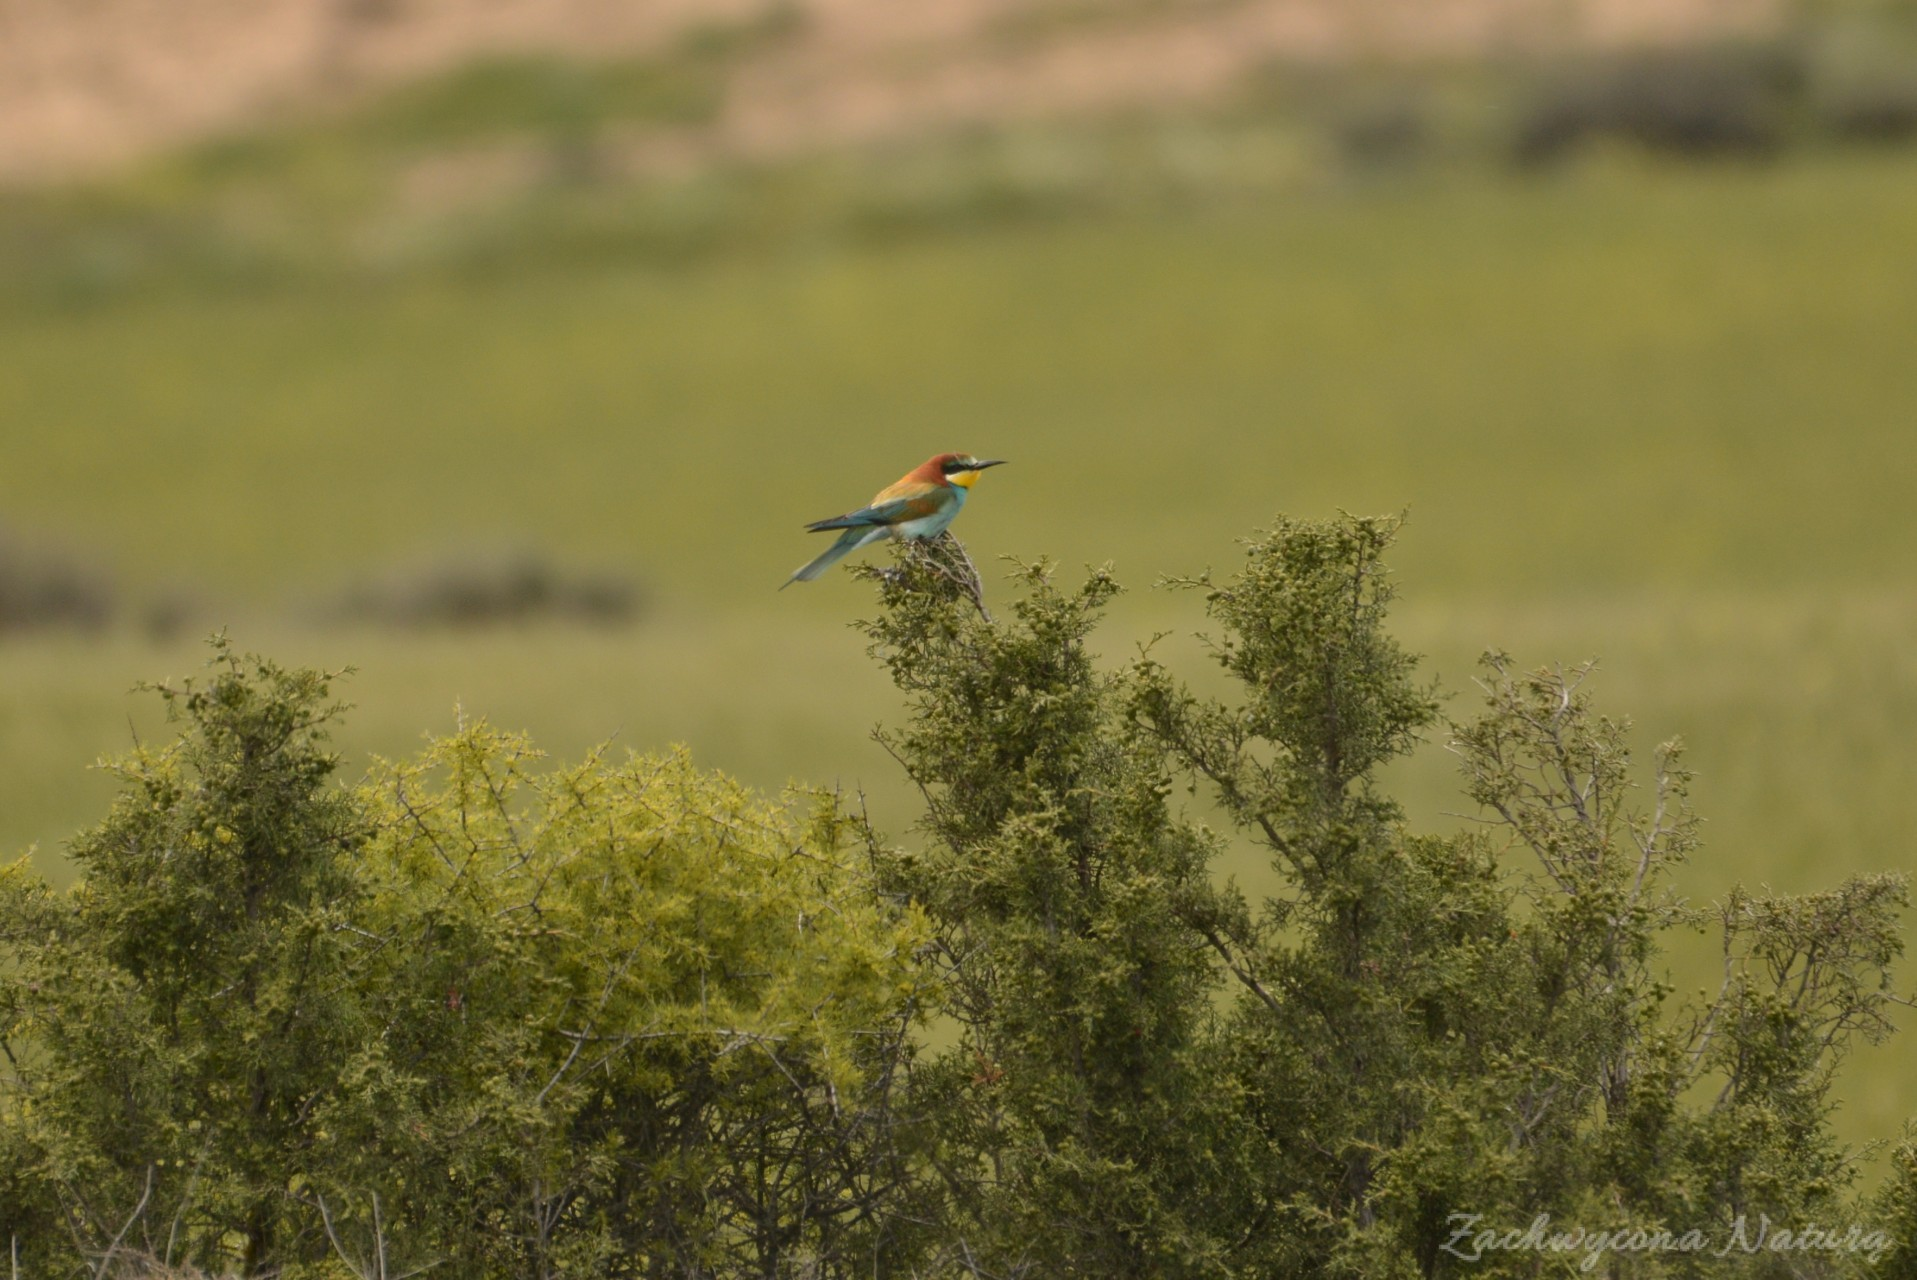 zolna-kolorowa-jak-papuga-merops-apiaster-bee-eater-7